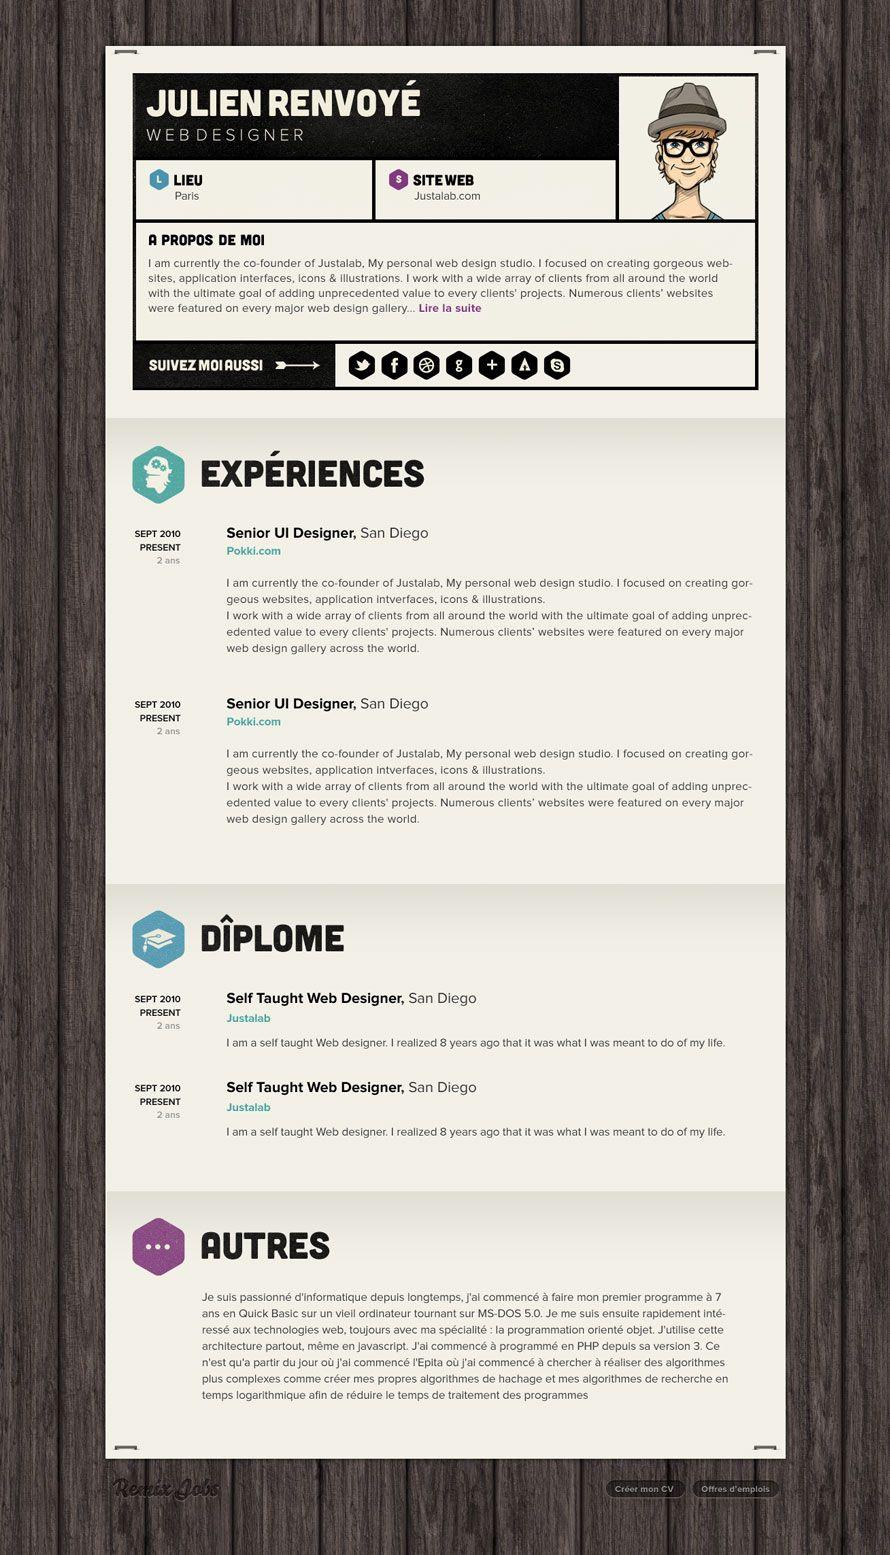 Emploi Informatique Et Recrutement Freelance Remixjobs Emploi Design Cv Inspiration Cv Ingenieur